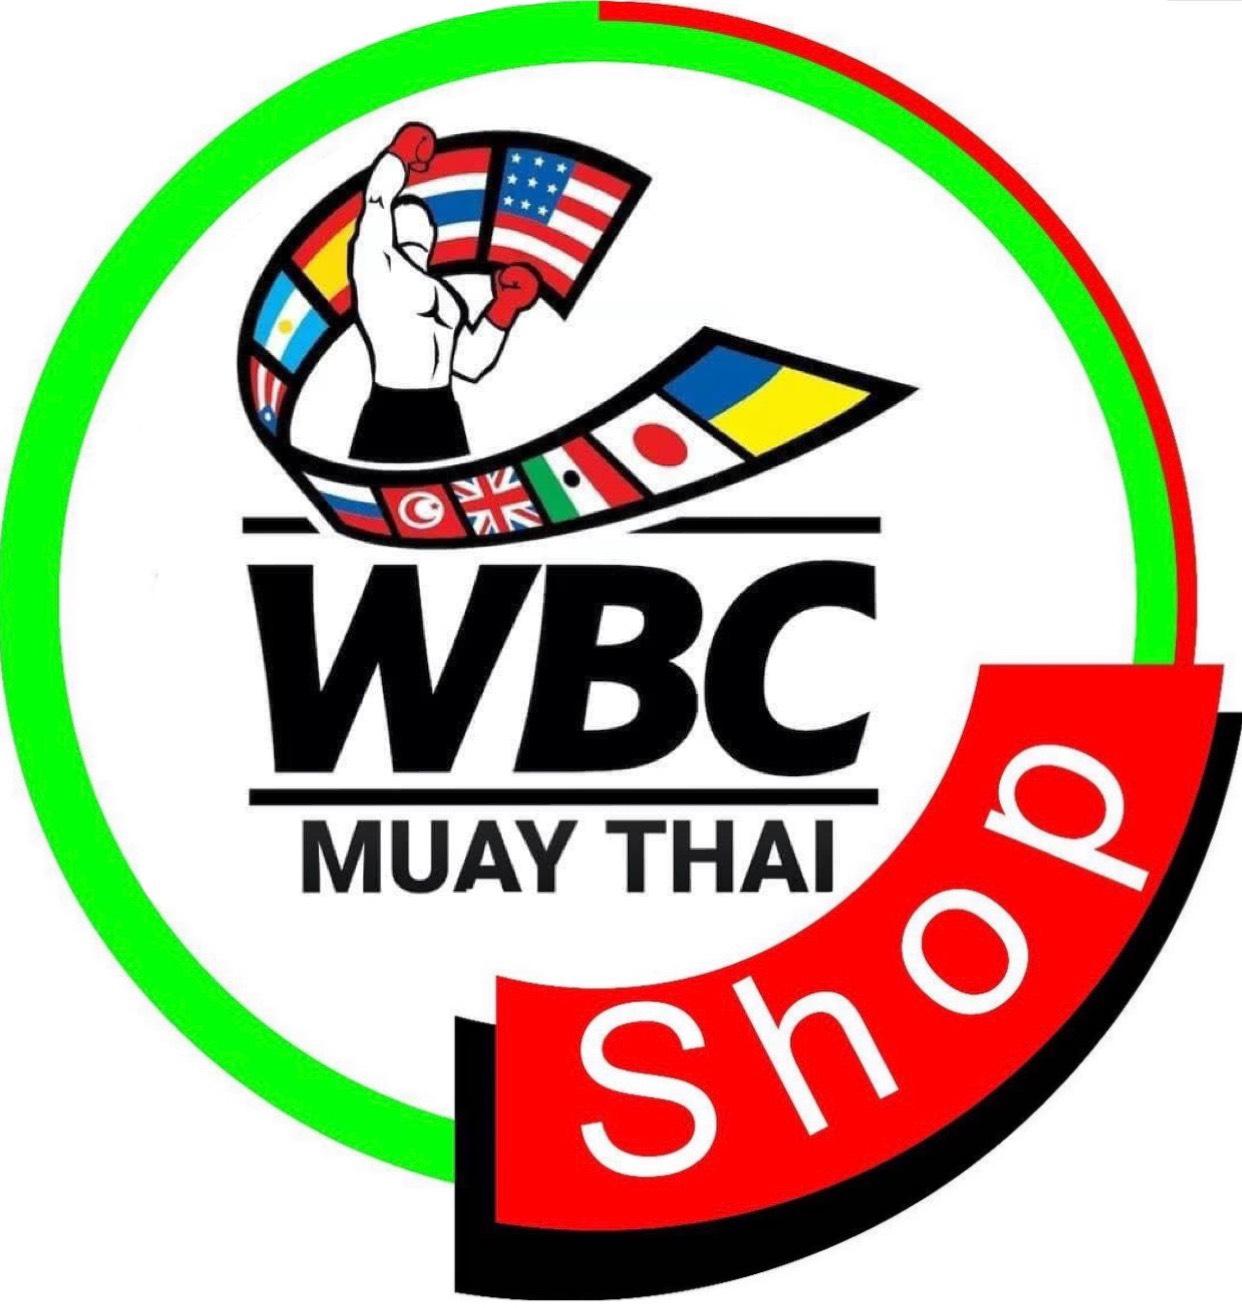 WBCMUAYTHAISHOP